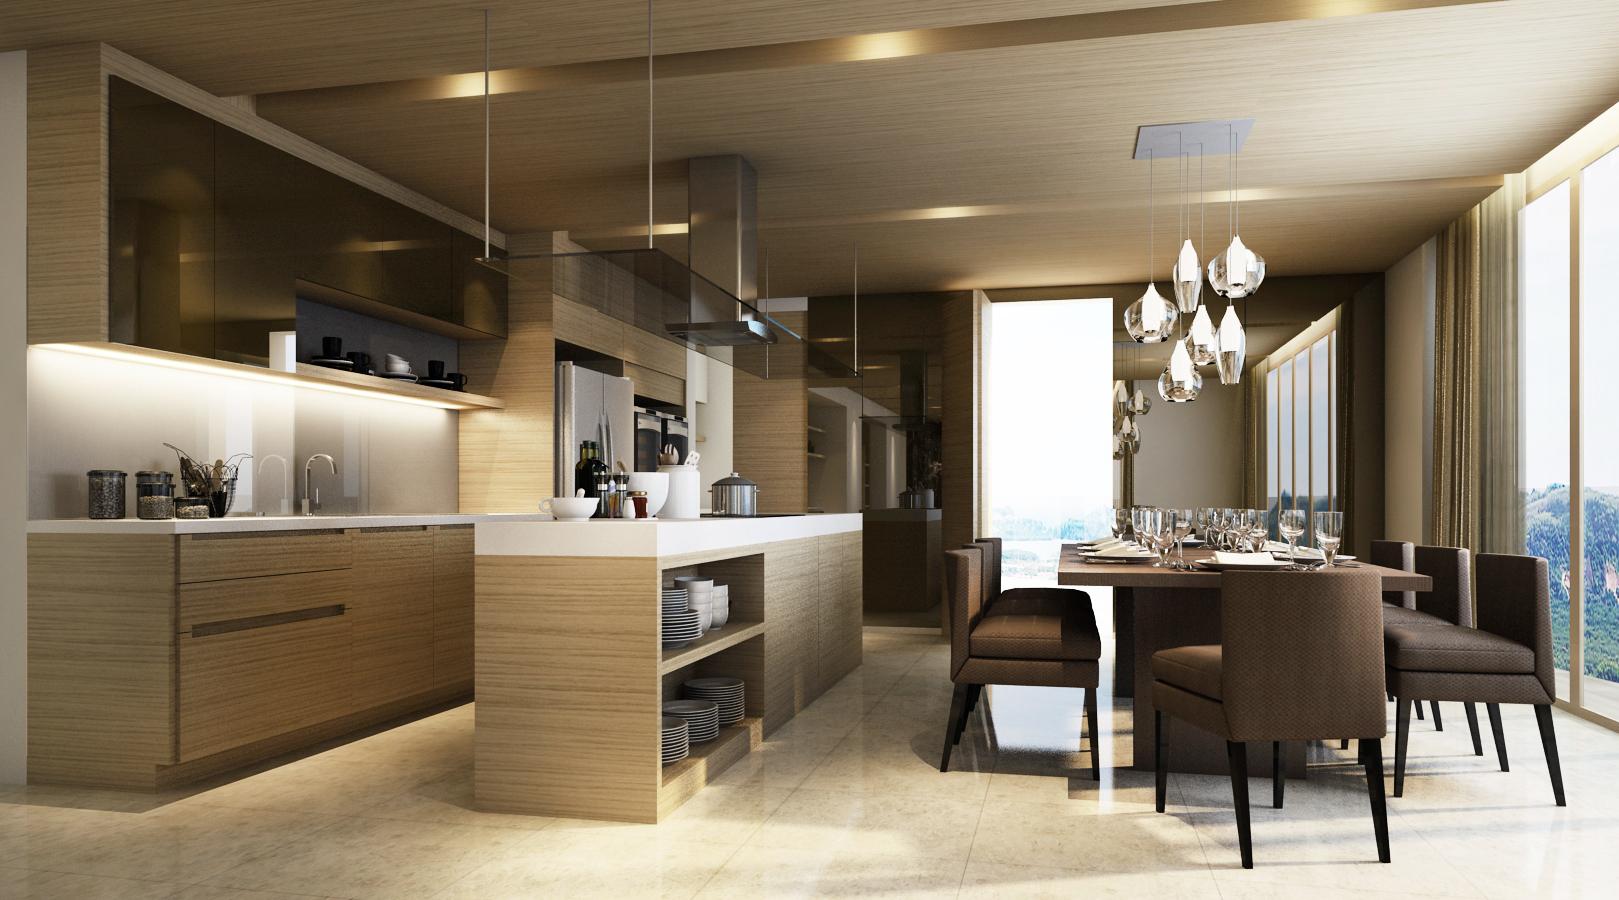 PENT 2 diningroom.jpg